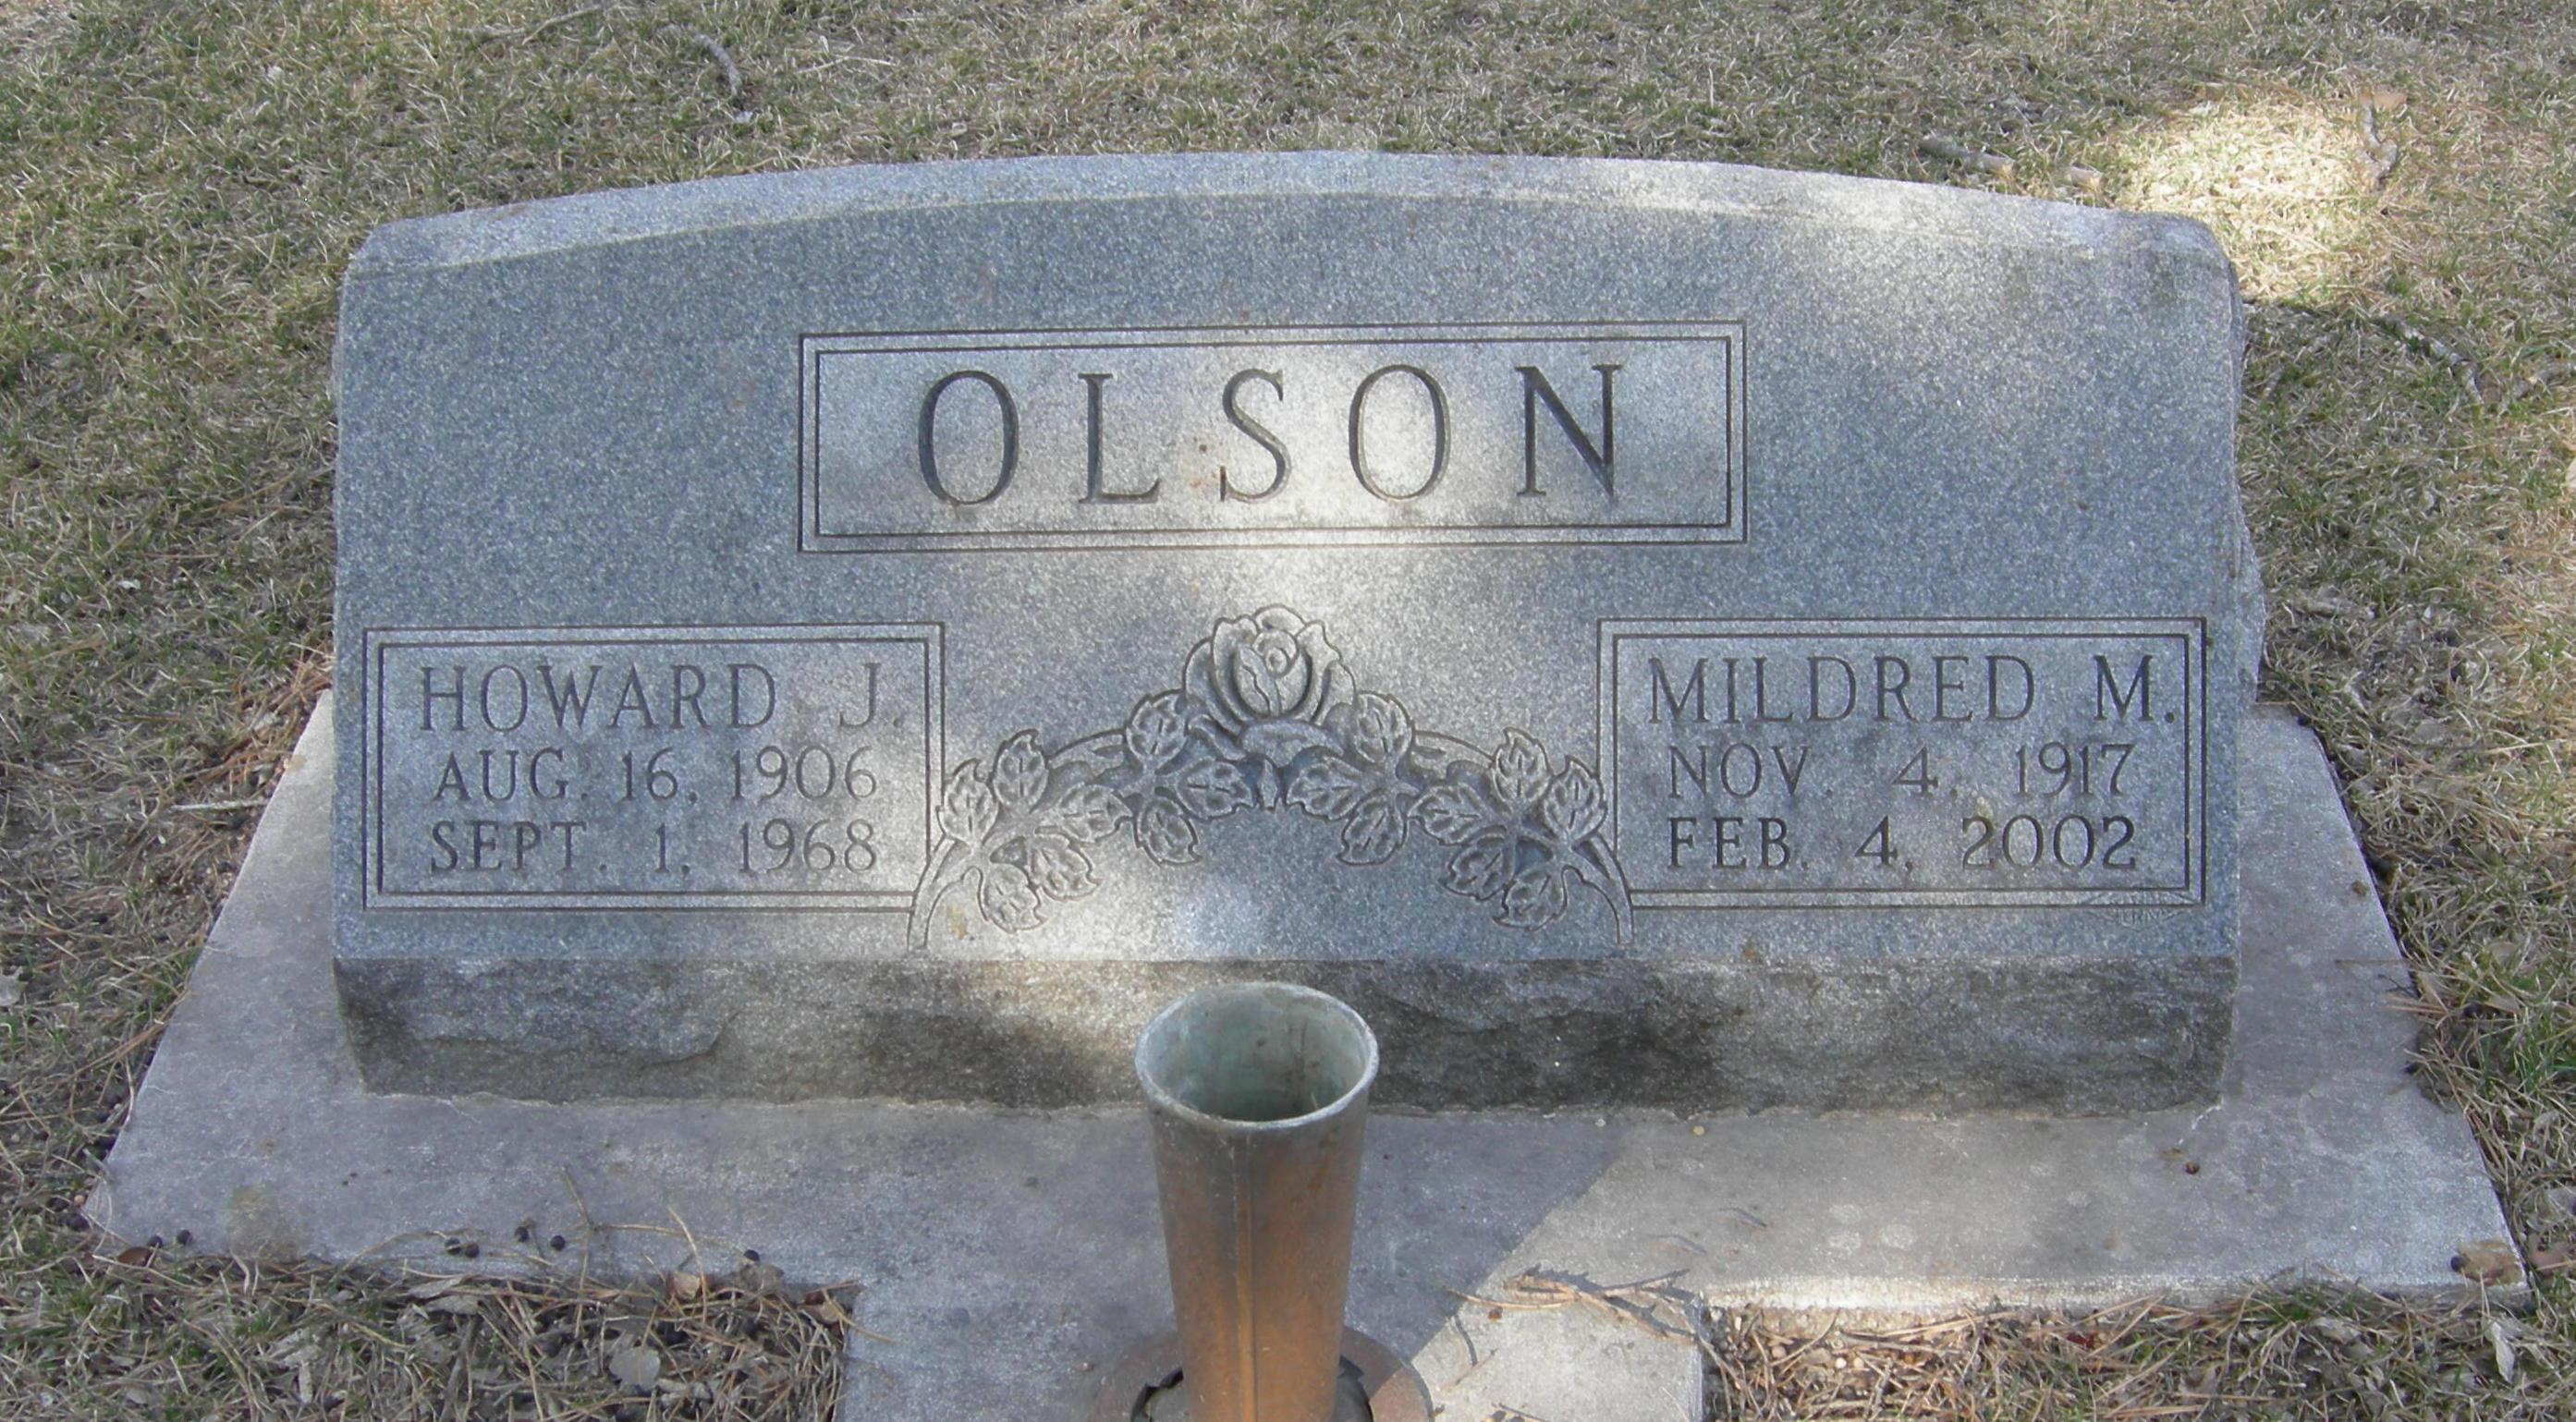 Howard J. Olson